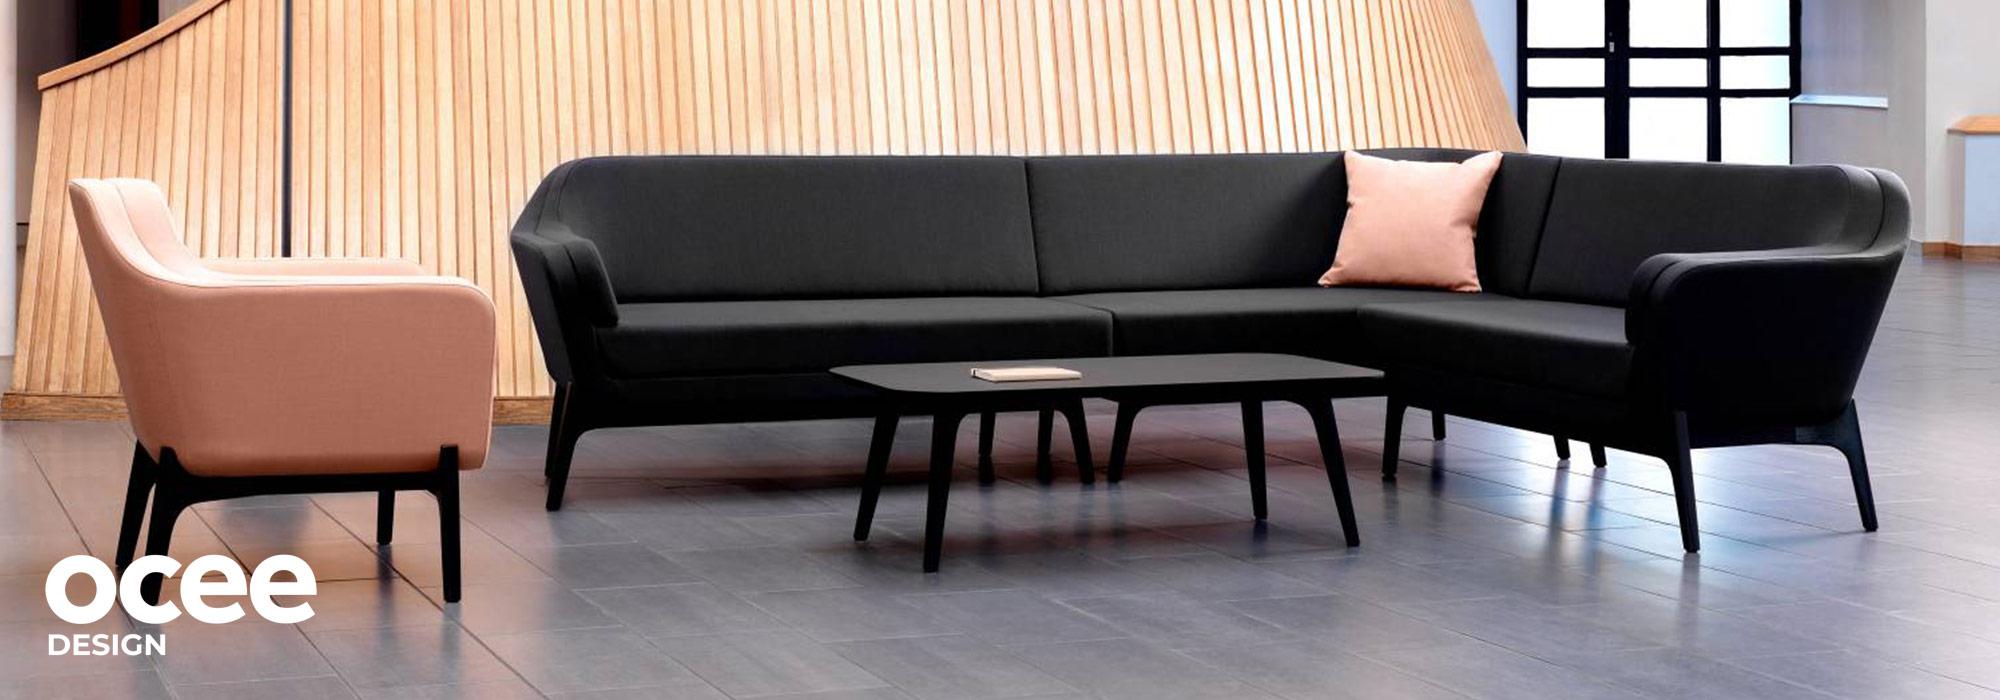 Ocee Design Harc Modular Sofa & Armchair